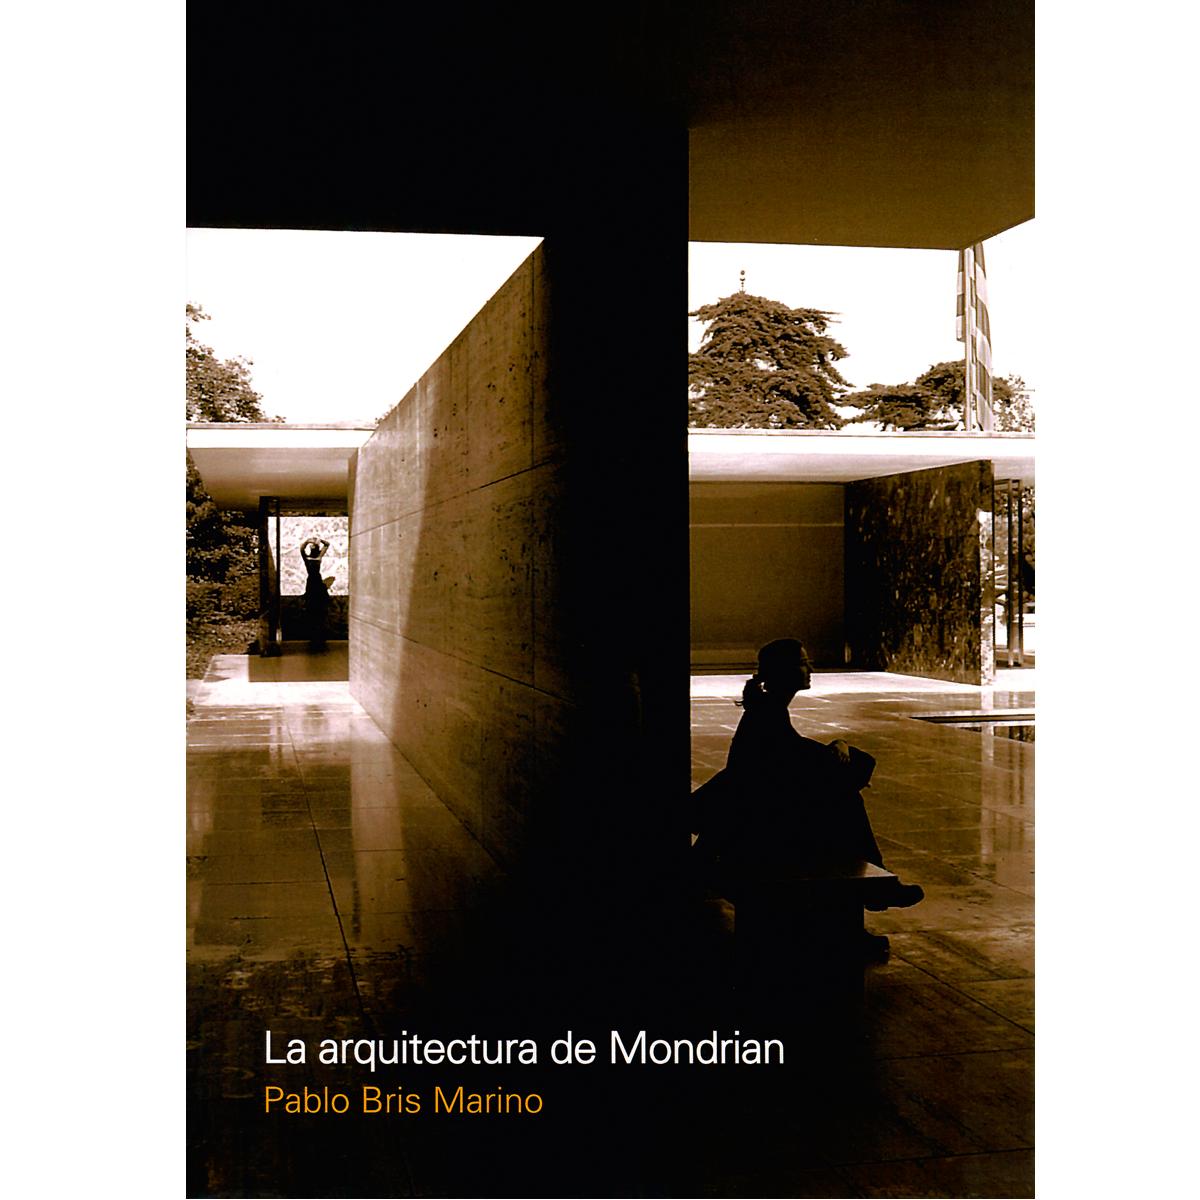 La arquitectura de Mondrian